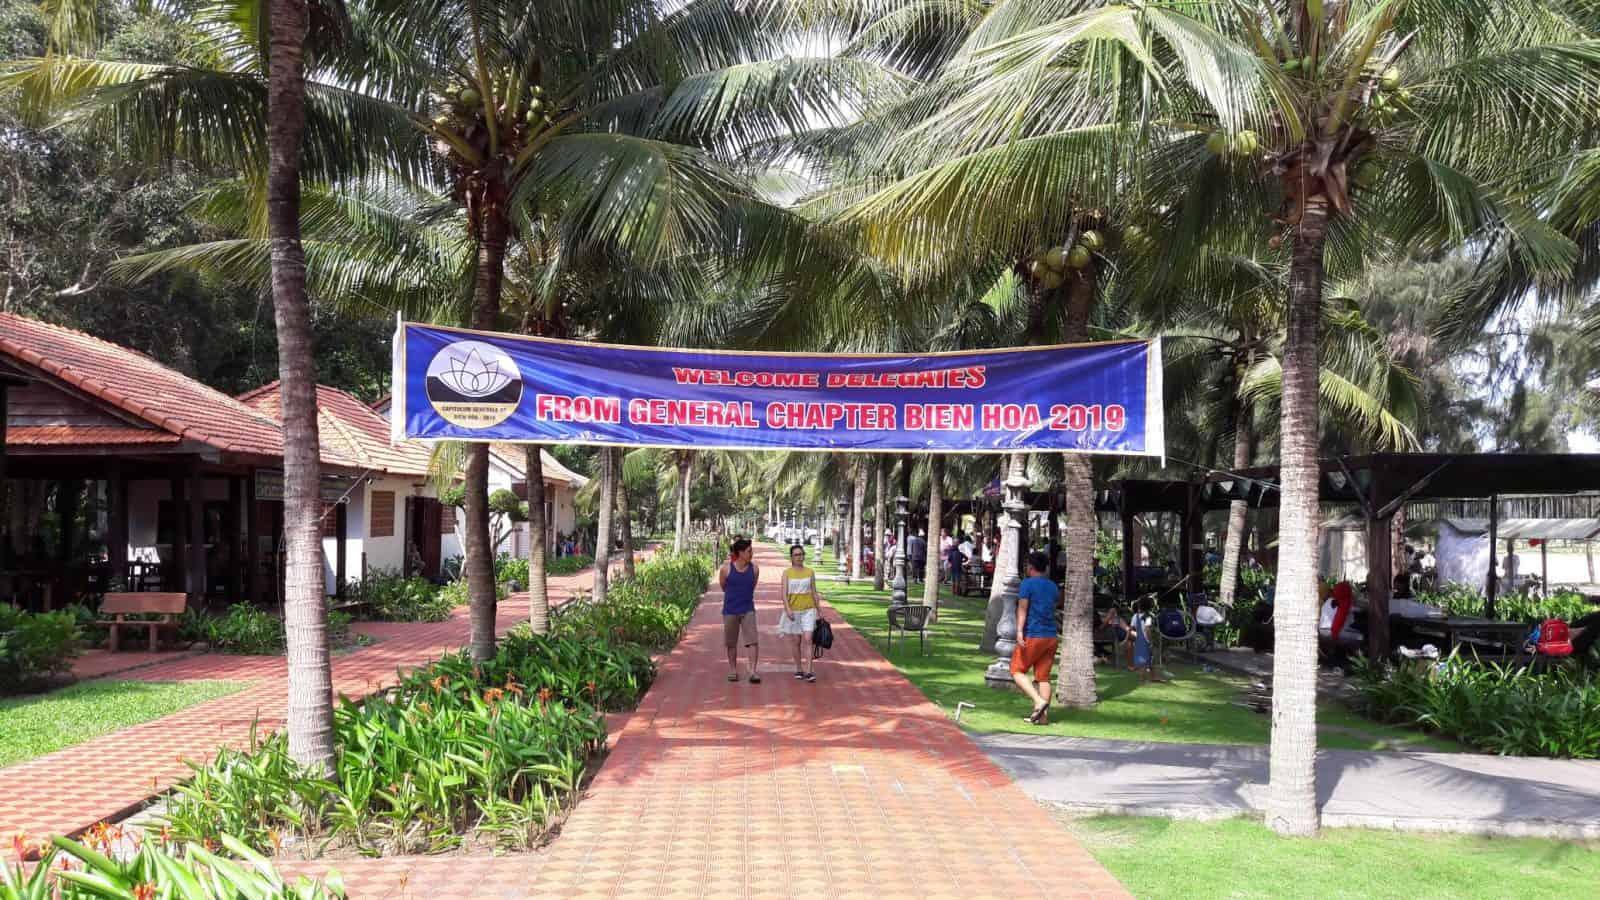 kapittel vietnam welkom spandoek